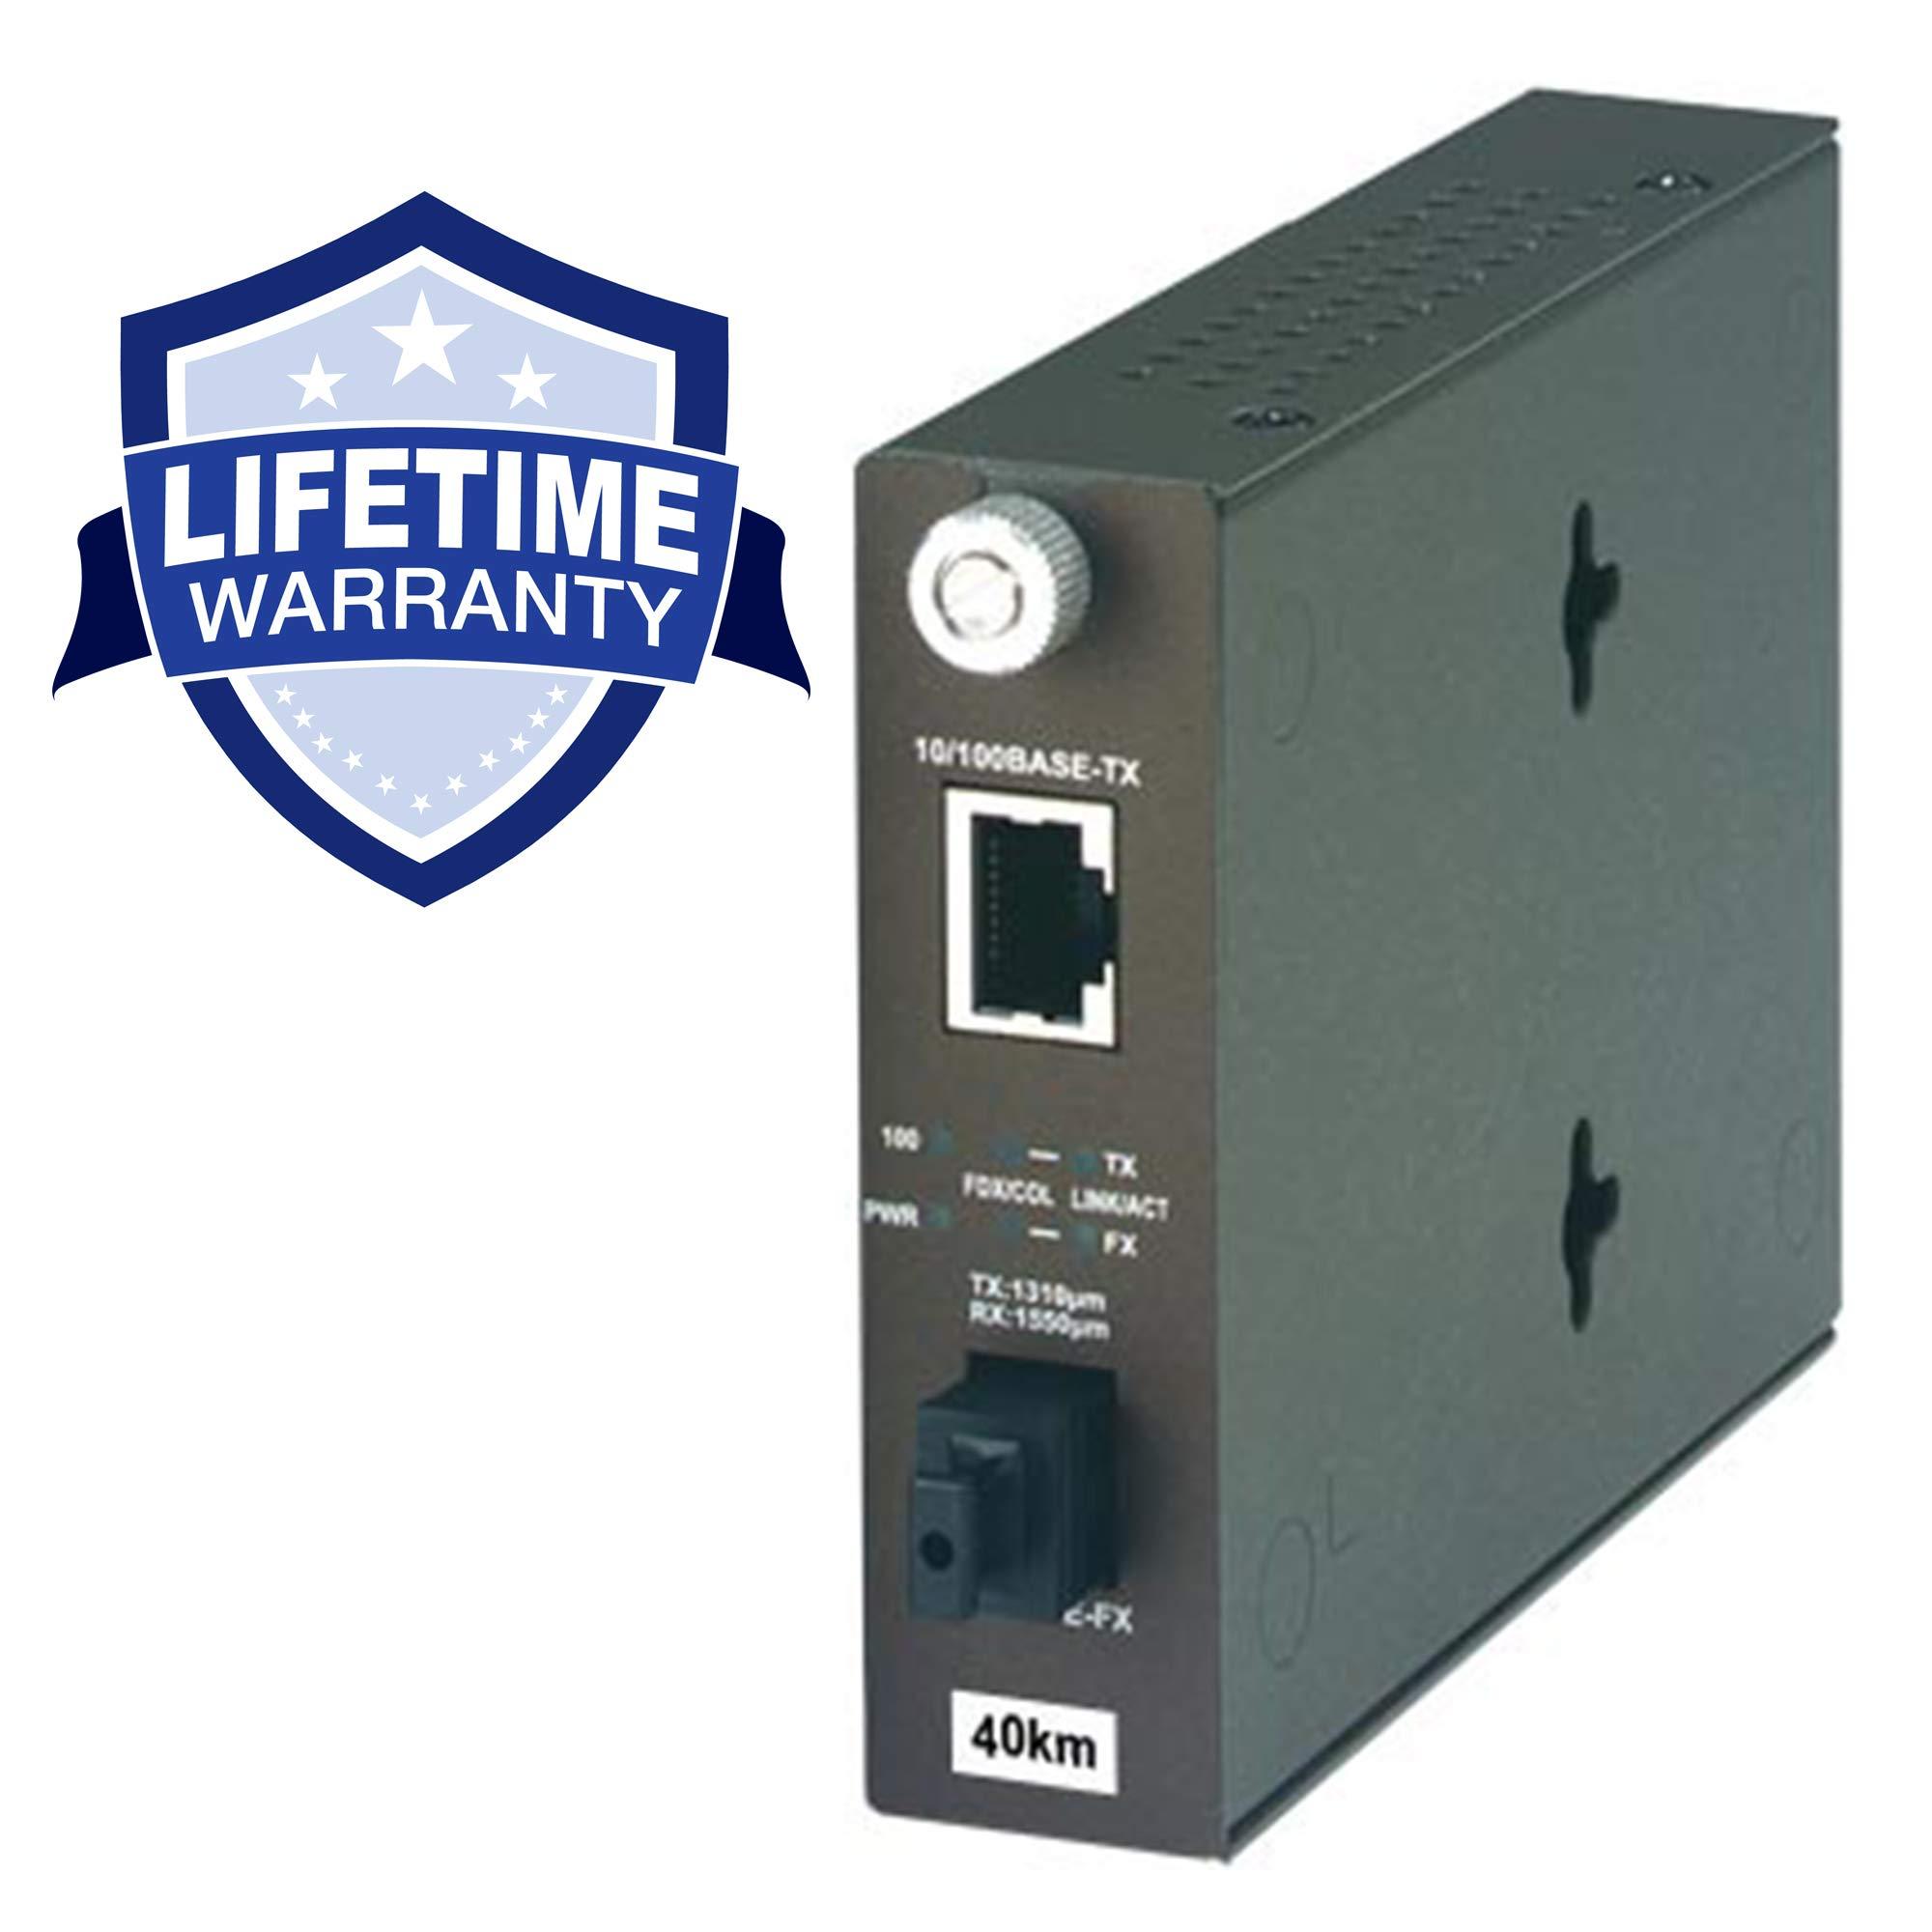 TRENDnet 100Base-TX to 100Base-FX Dual Wavelength Single Mode SC Fiber Converter TX:310nm (40 Km, 24.9 Miles), Lifetime Protection, TFC-110S40D3